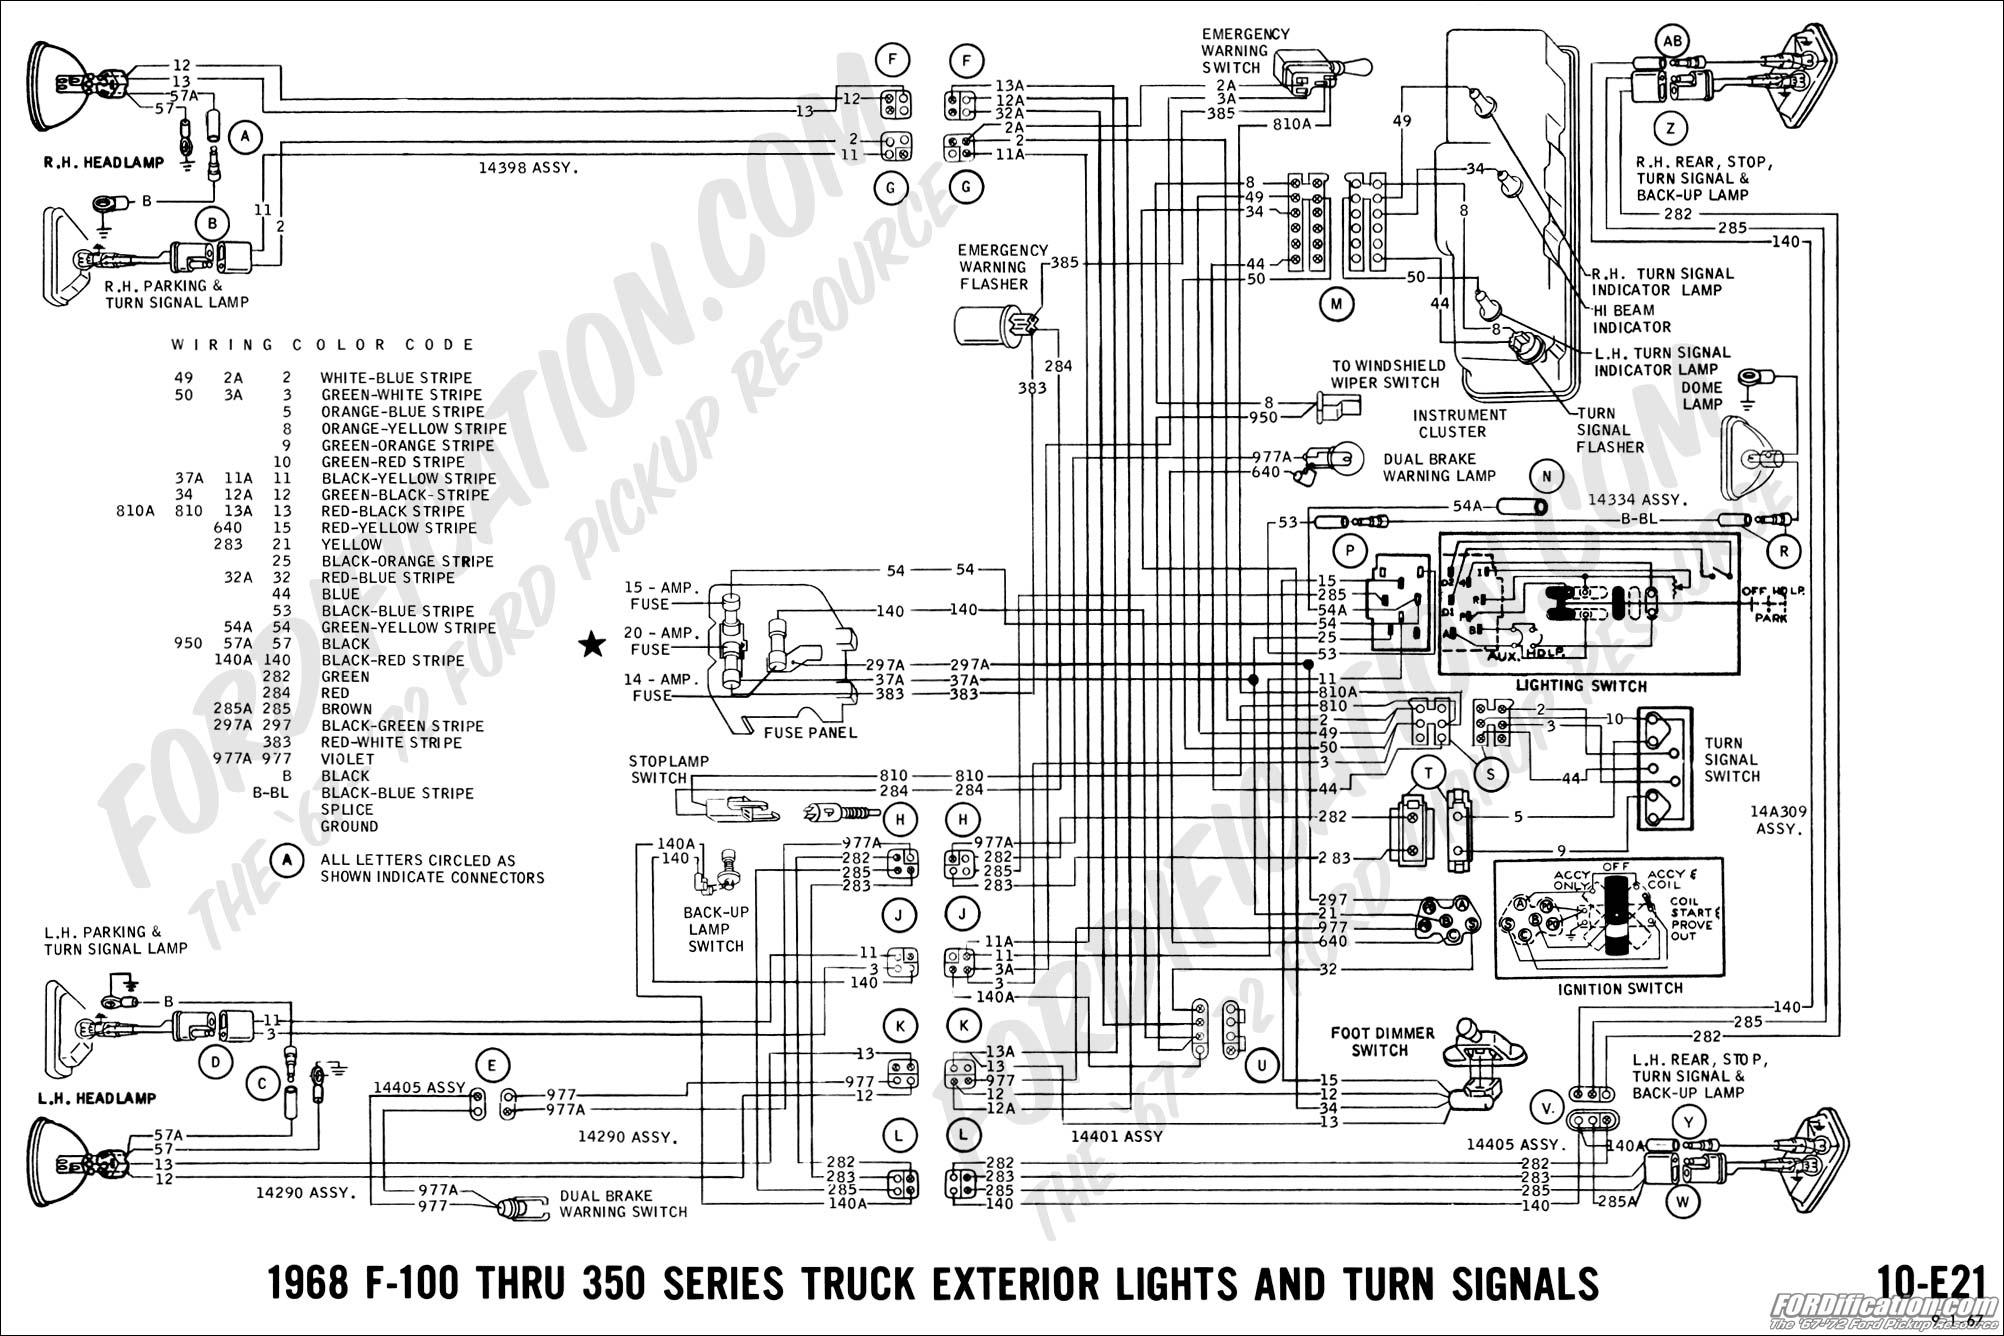 Tremendous 77 Ford F250 Wiring Diagram Wiring Diagram Wiring Cloud Apomsimijknierdonabenoleattemohammedshrineorg